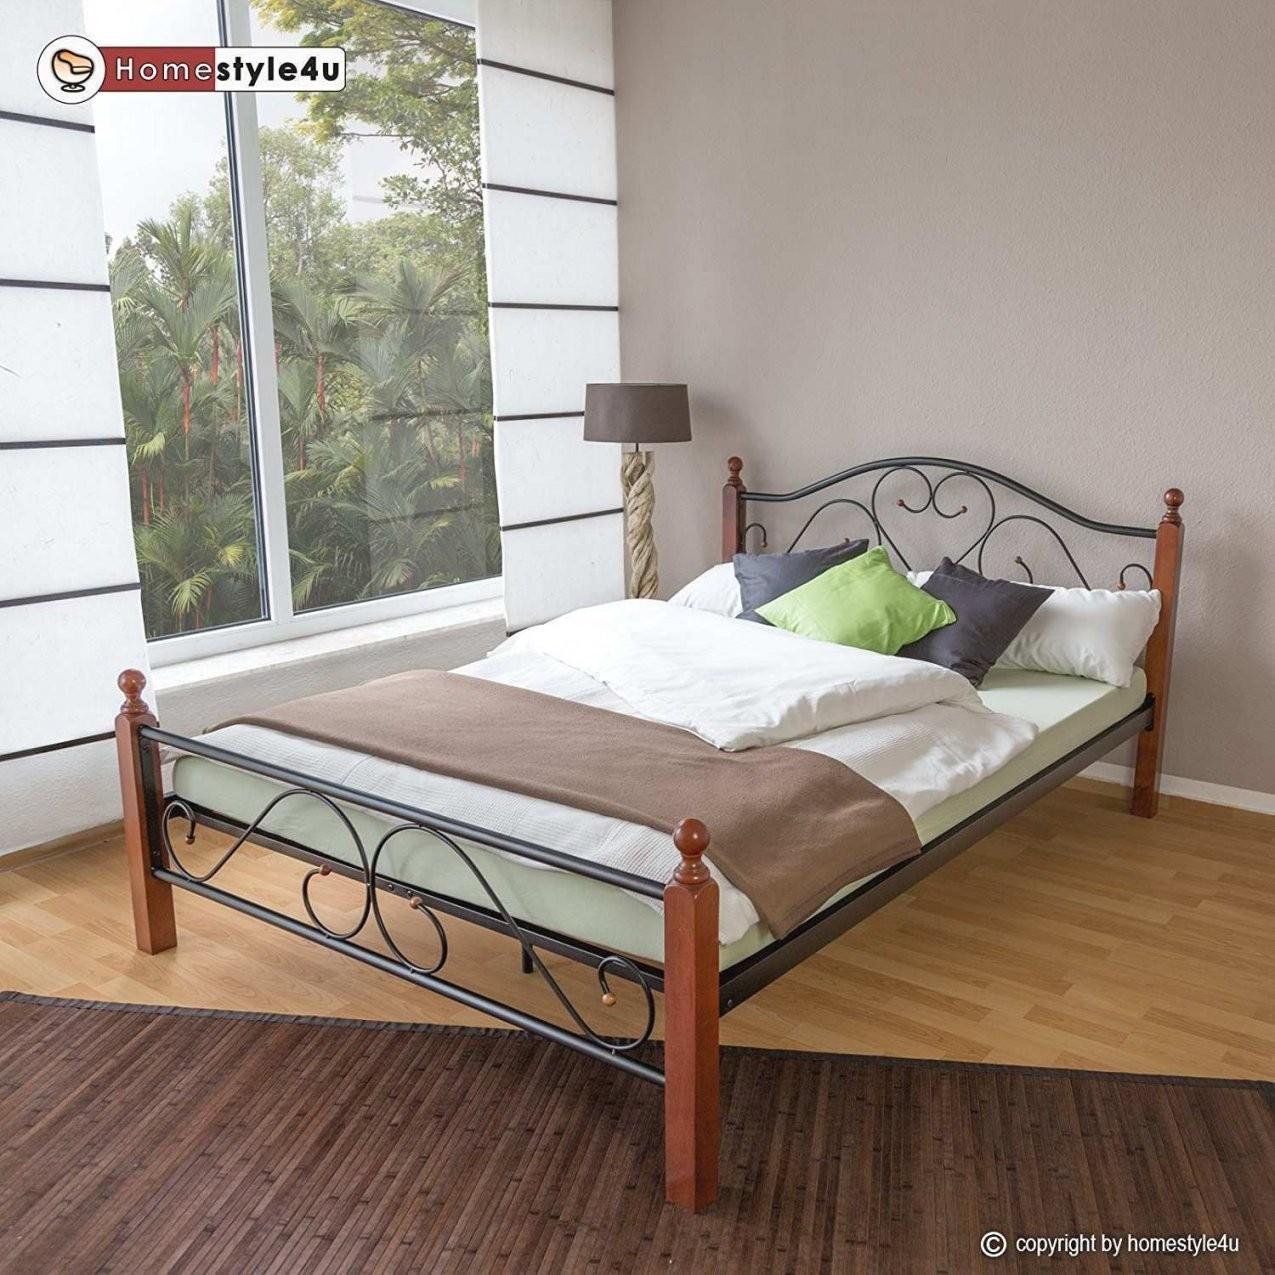 Bett Mit Matratze Und Lattenrost 160×200 Elegant Bett 160×200 Mit von Bett Mit Matratze Und Lattenrost 160X200 Bild